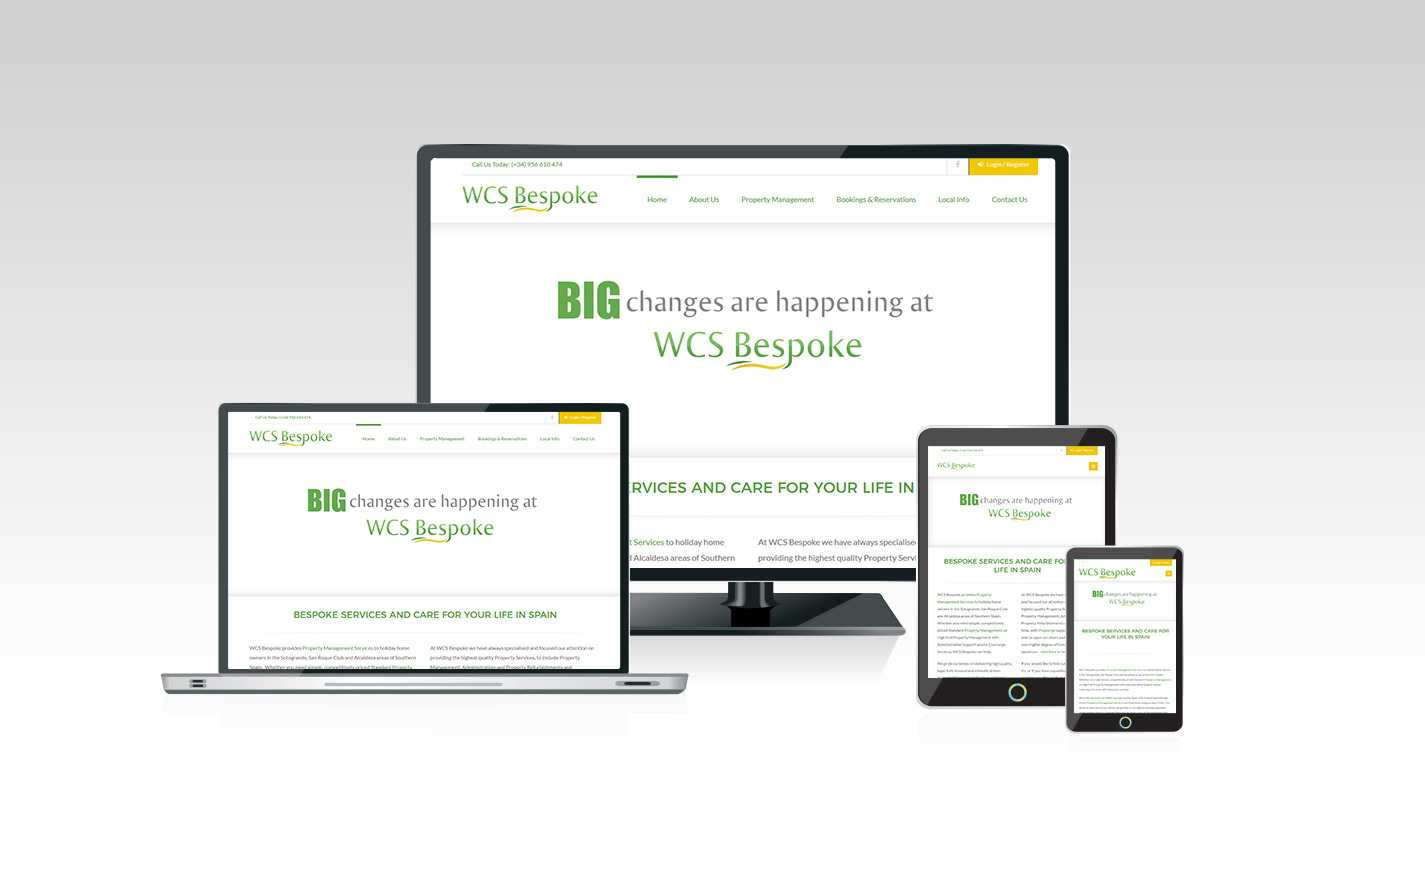 New WCS Bespoke website now Live